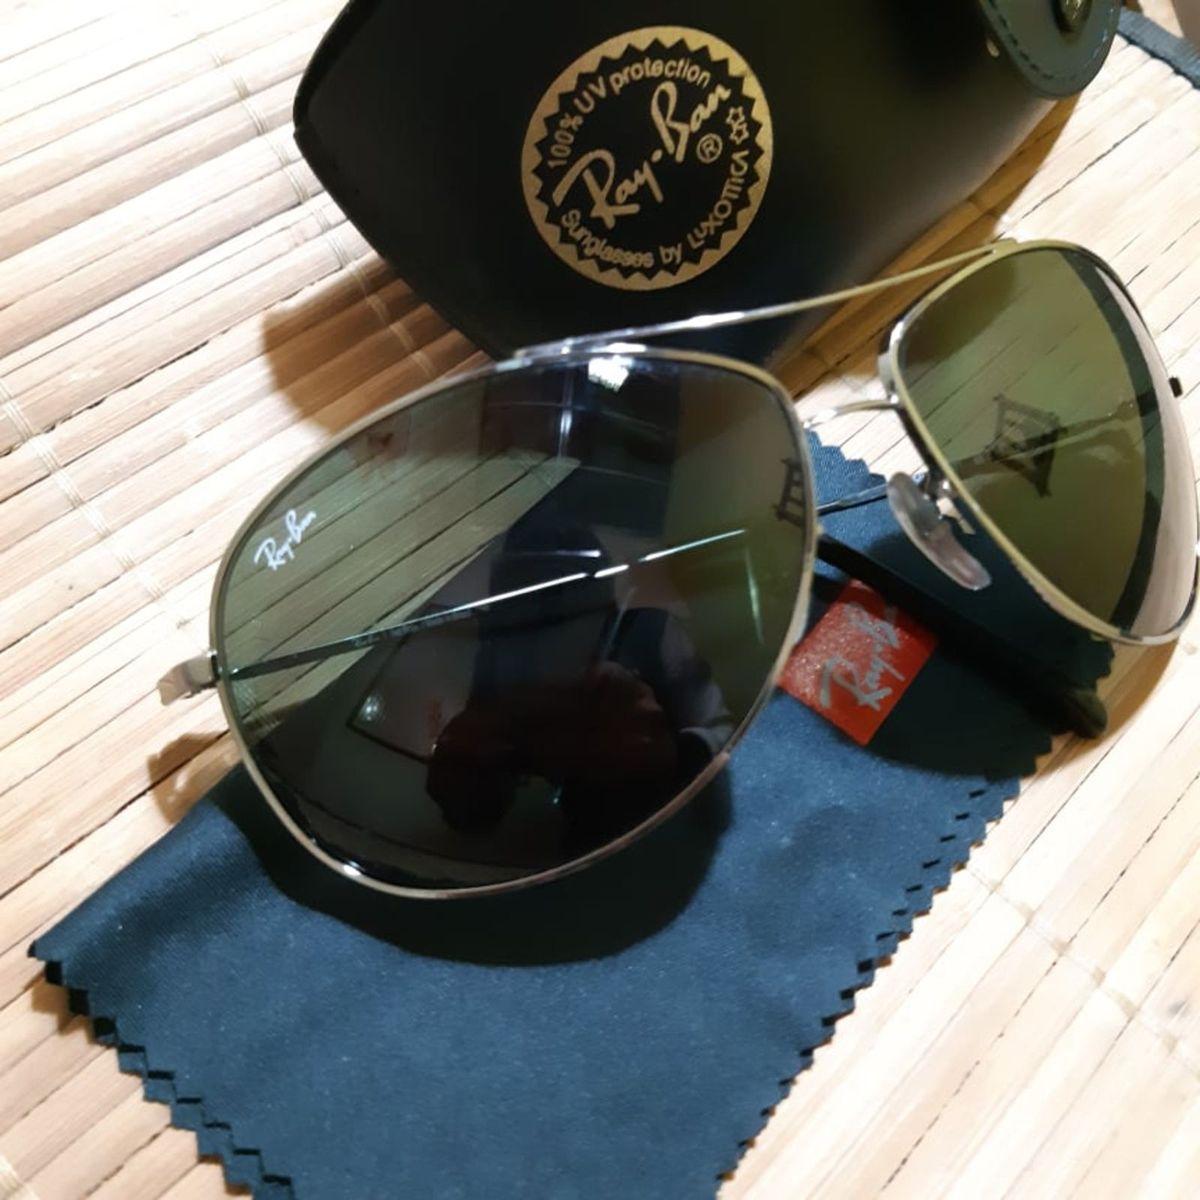 ef83ec71ad5bd óculos ray-ban original novo - óculos ray-ban.  Czm6ly9wag90b3muzw5qb2vplmnvbs5ici9wcm9kdwn0cy84ntkwmdyvytq5mdniymvhmtbknjbmmzgyzwi0zjq1y2jmzdvjmwquanbn  ...